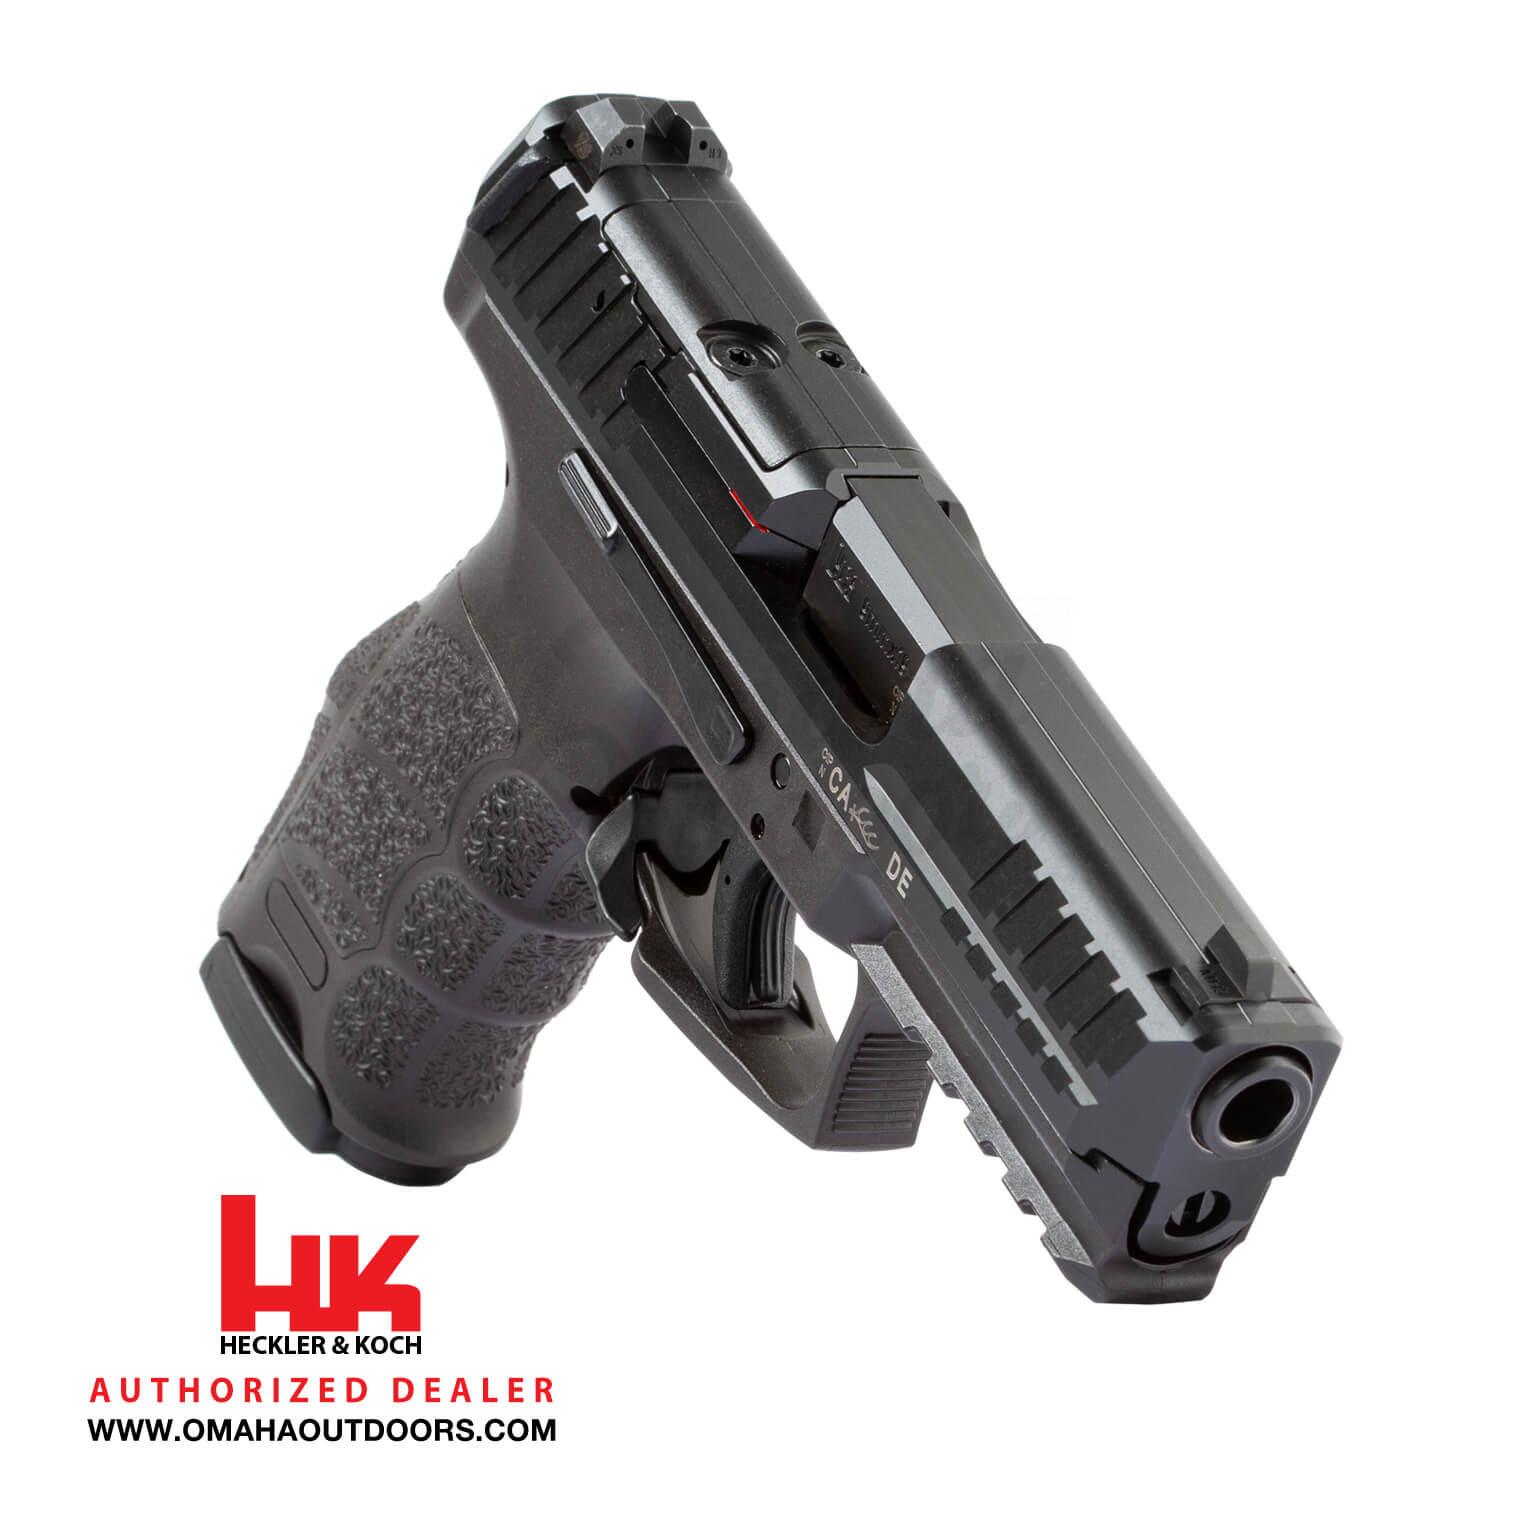 HK VP9 2020 LE Optics Ready Pistol 9mm 10 RD Night Sights